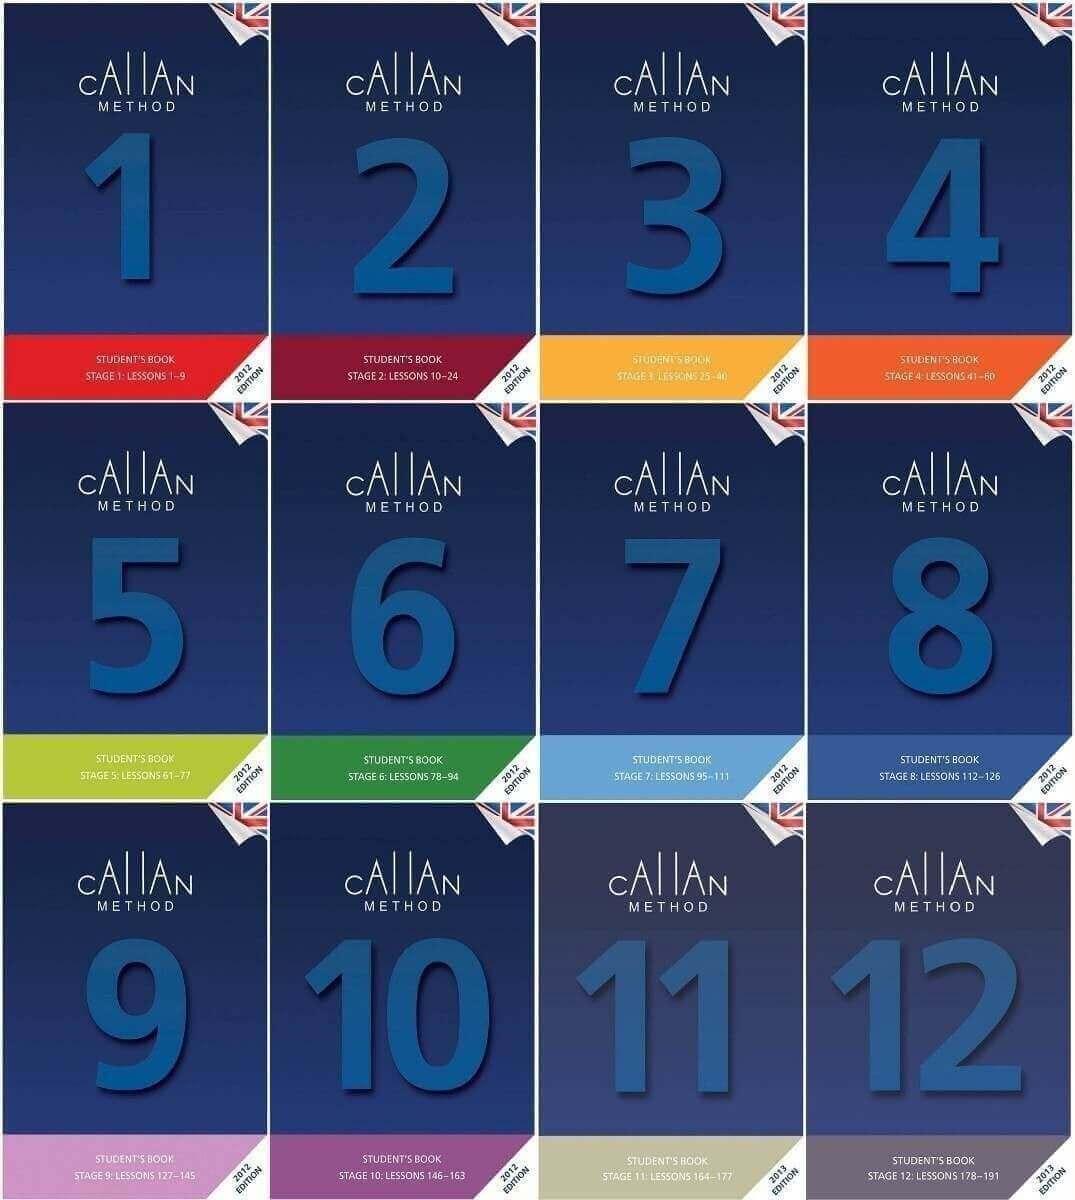 12 Bücher der Callan-Methode